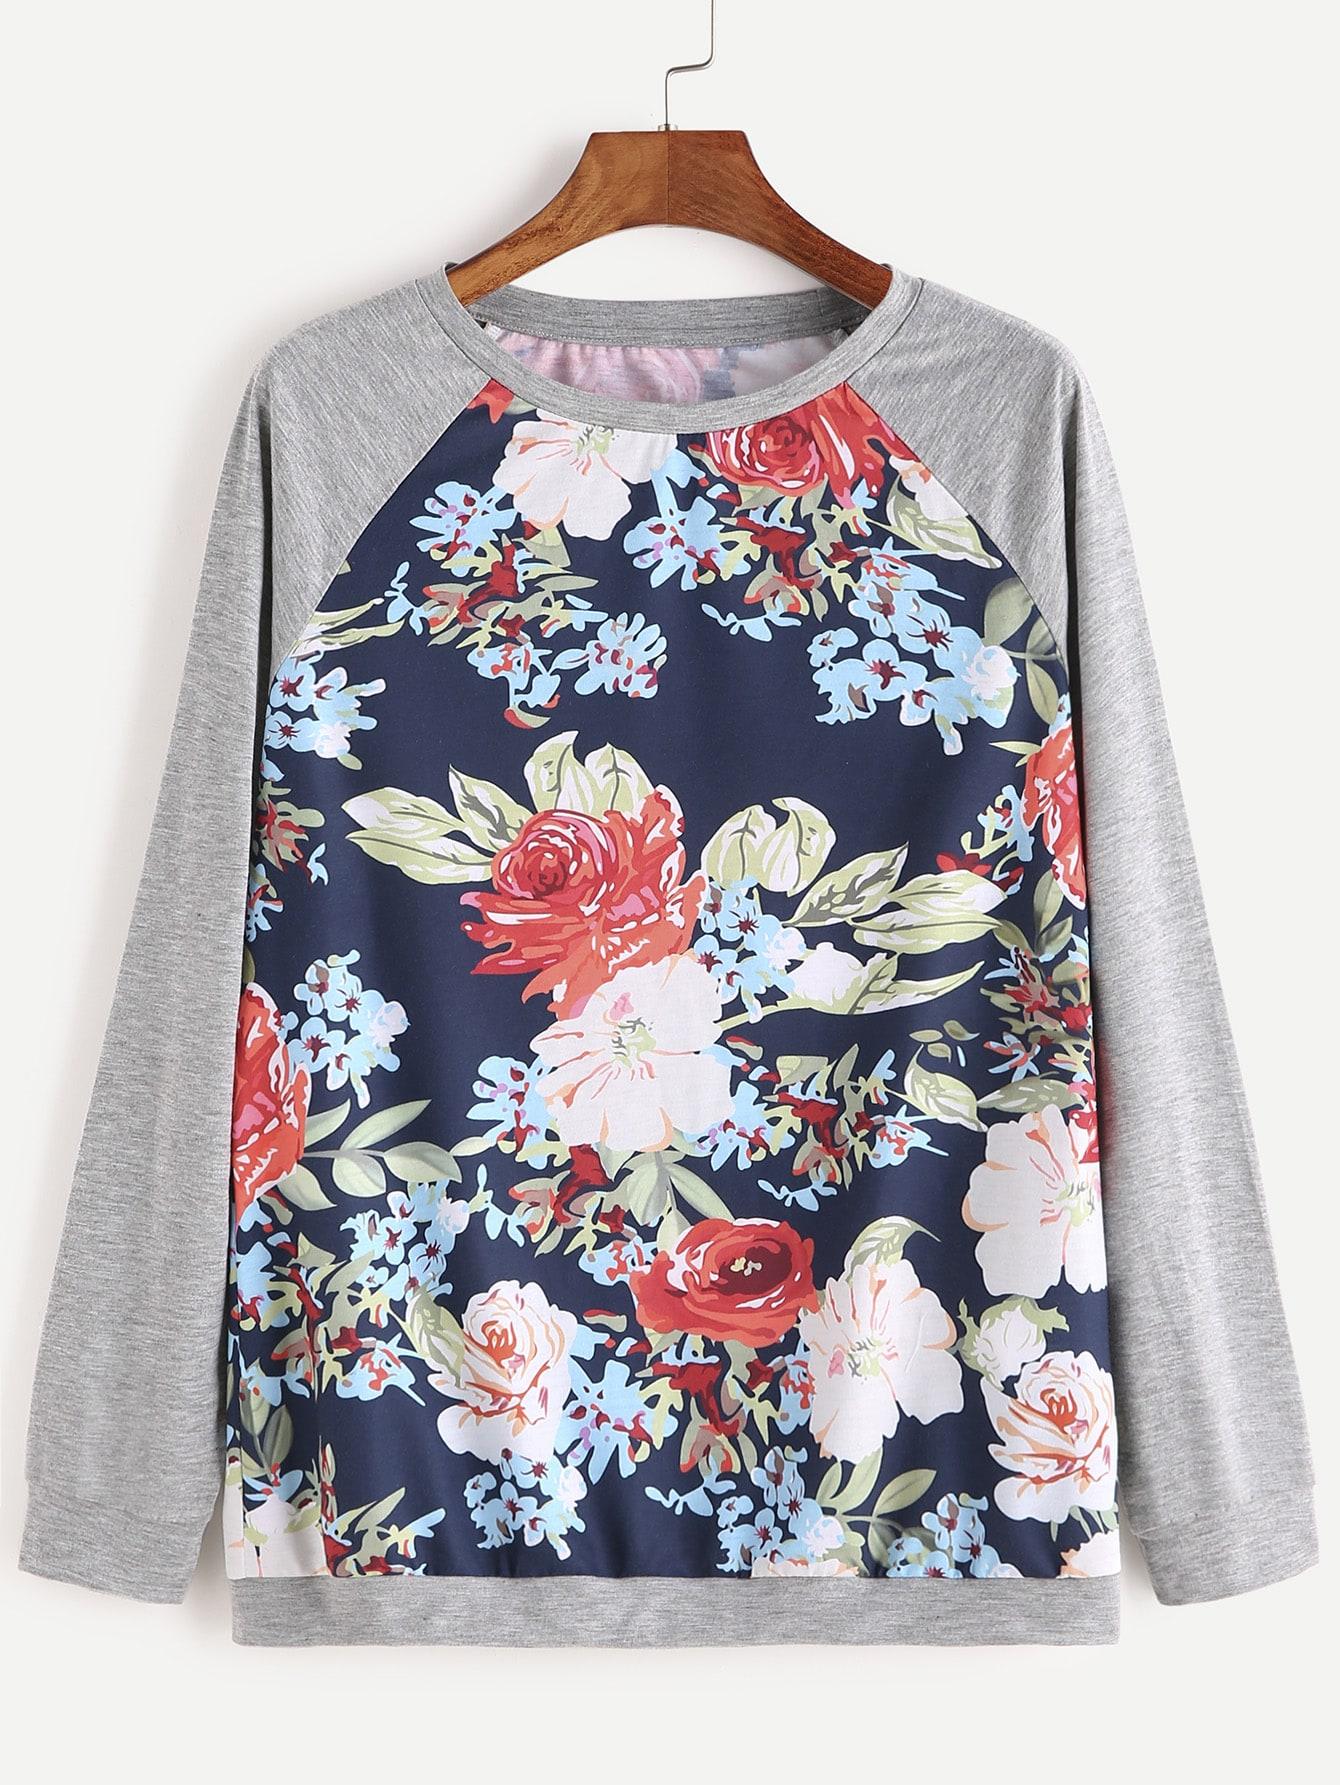 Multicolor Floral Print Raglan Sleeve Sweatshirt sweatshirt161201703